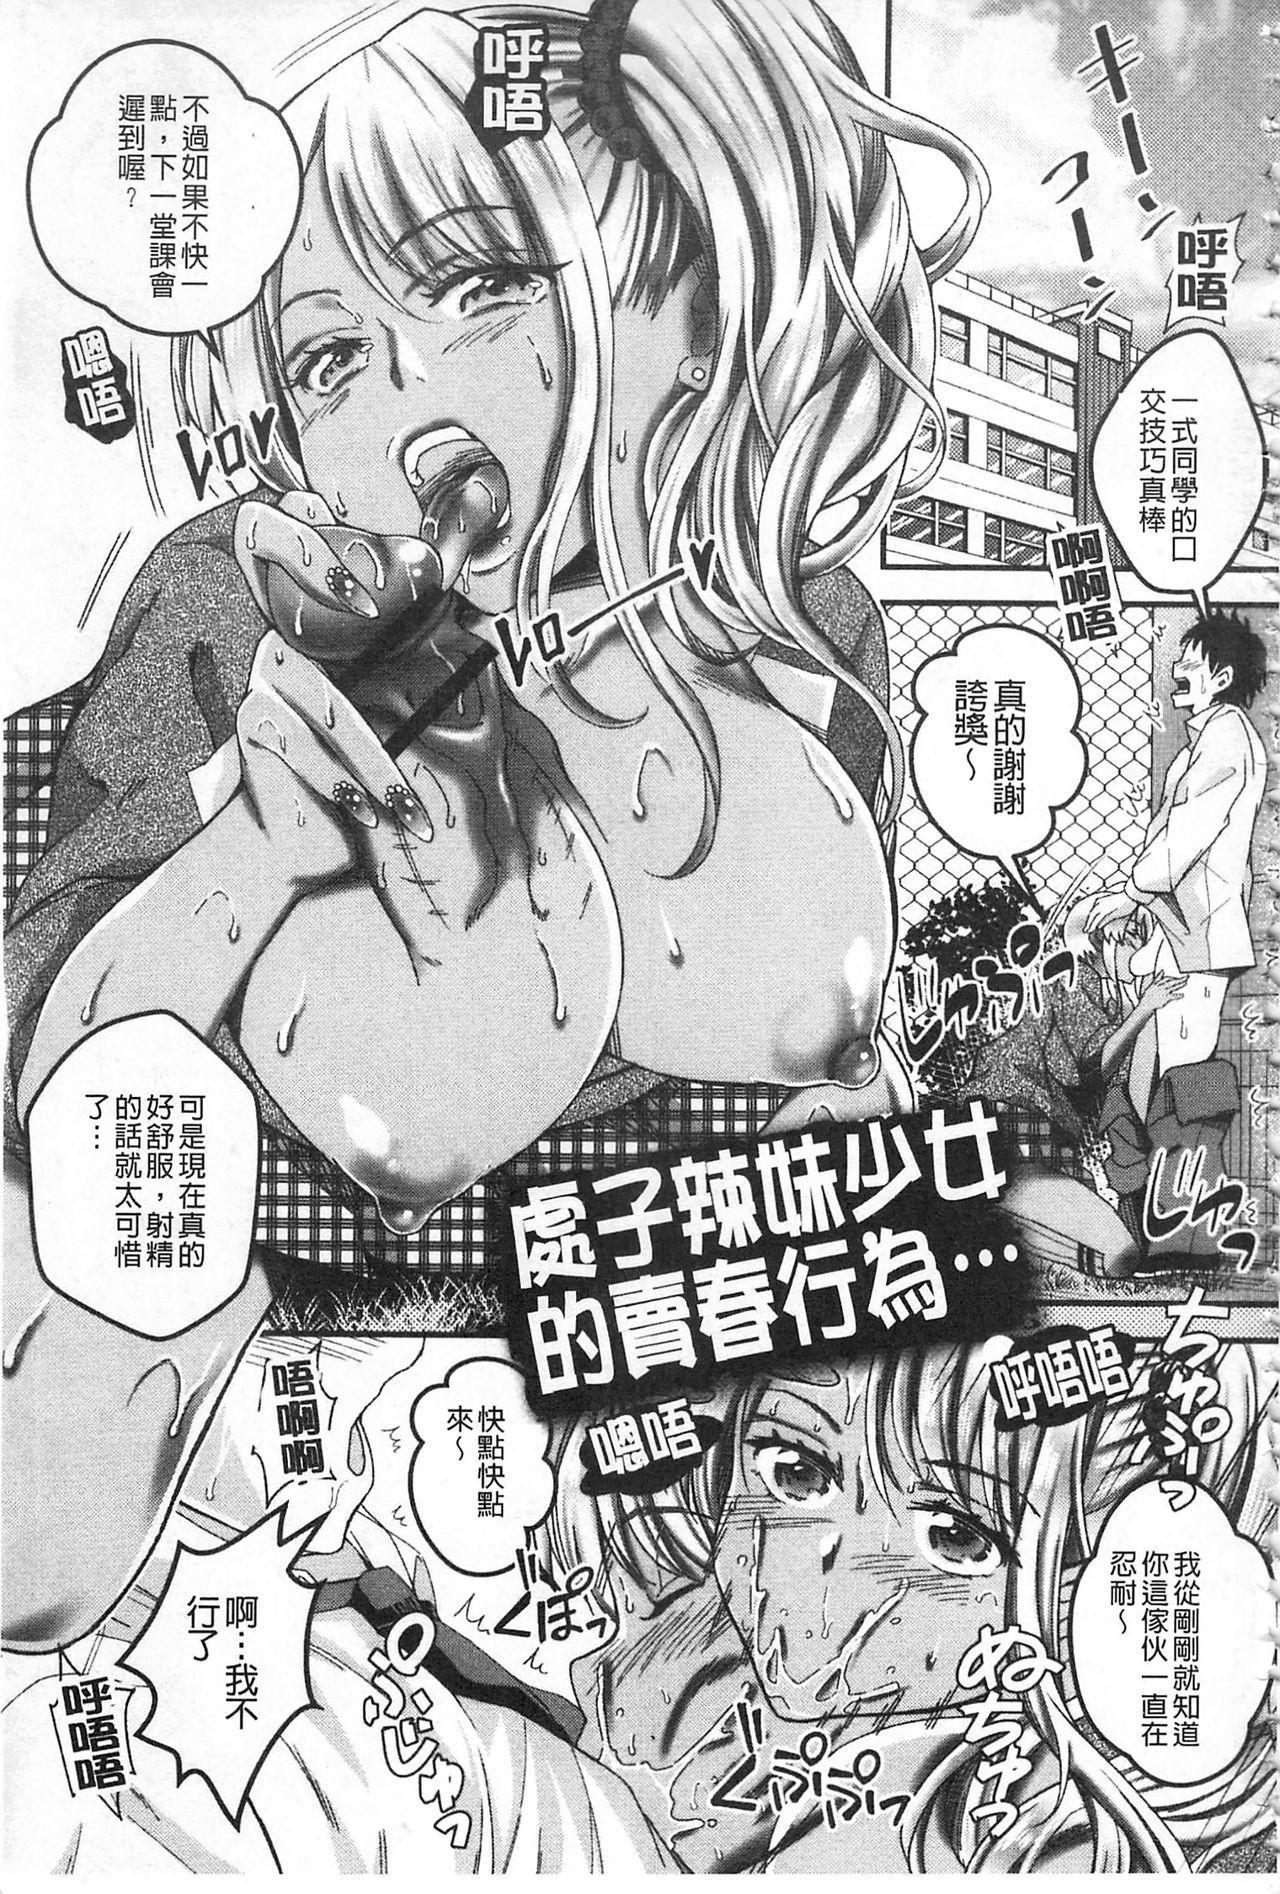 Kanjuku Otome no Odoshikata | 姦熟乙女的脅迫法 74